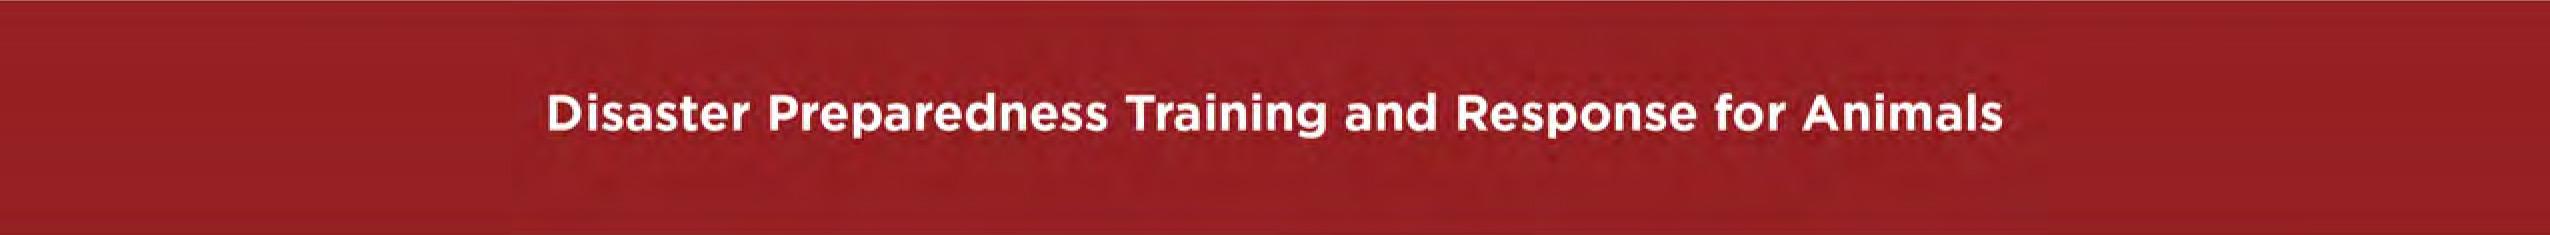 Disaster Preparedness Training and Response for Animals